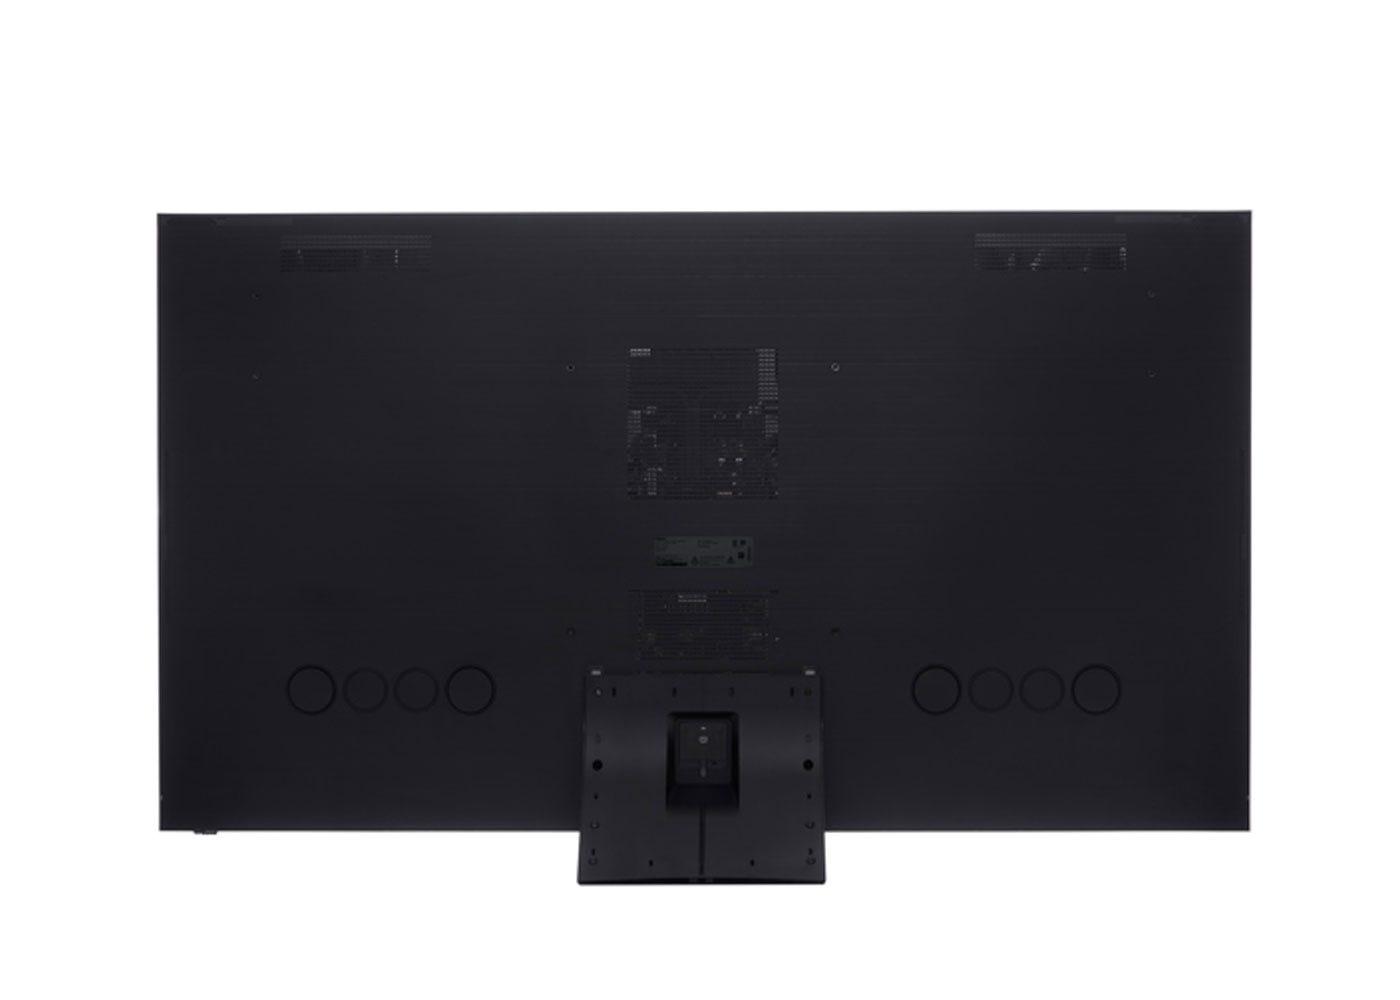 As shown: Samsung 2020 85 Q950TS Flagship QLED 8K HDR 4000 Smart TV - Rear profile.